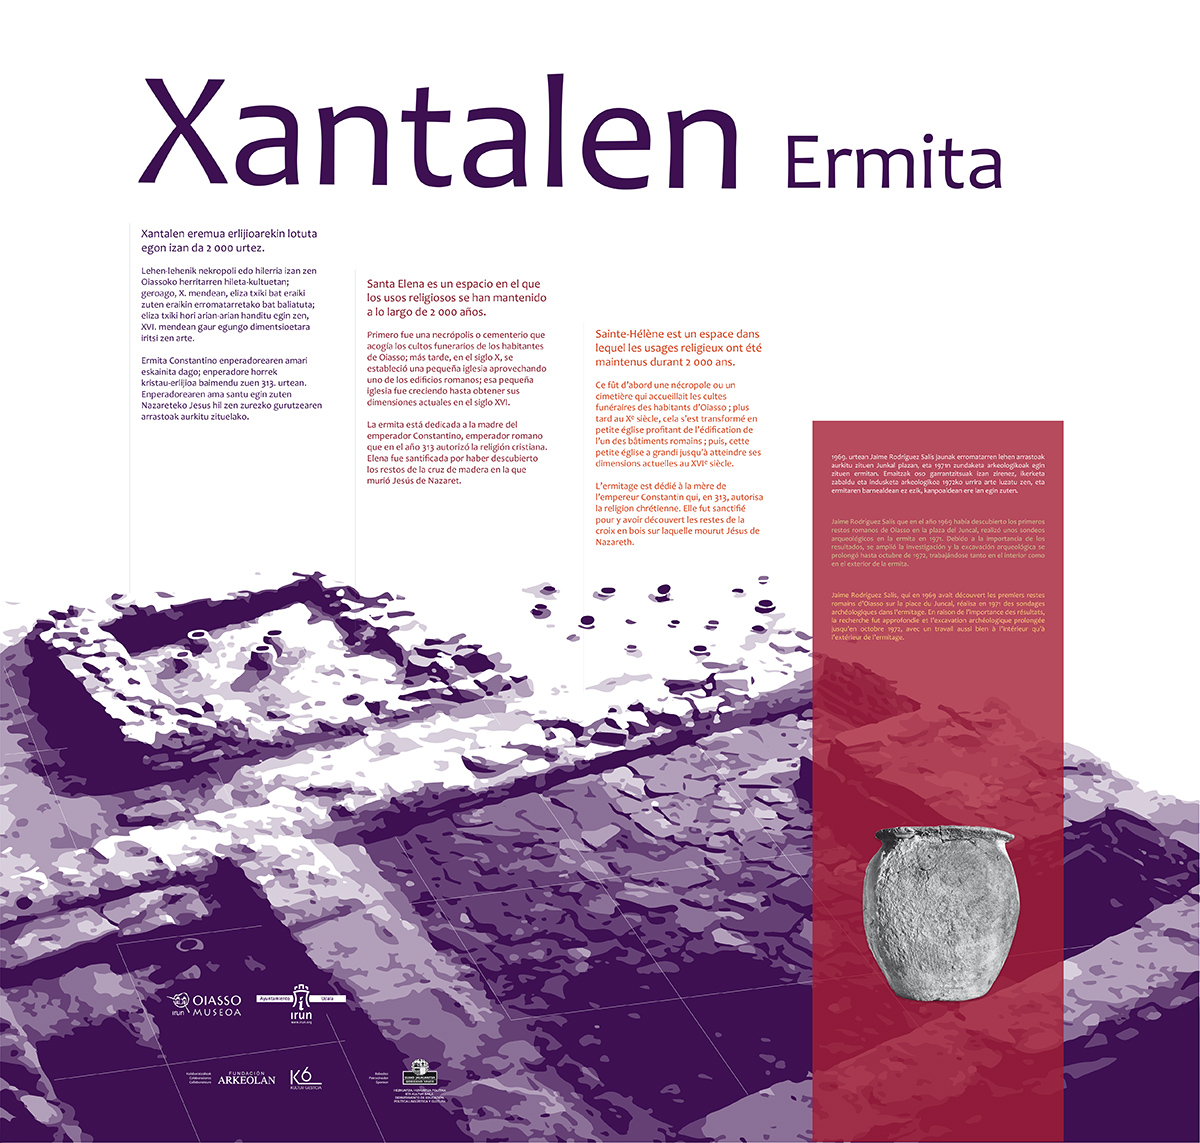 Línea gráfica para la exposición «Xantalen Ermita» en STM